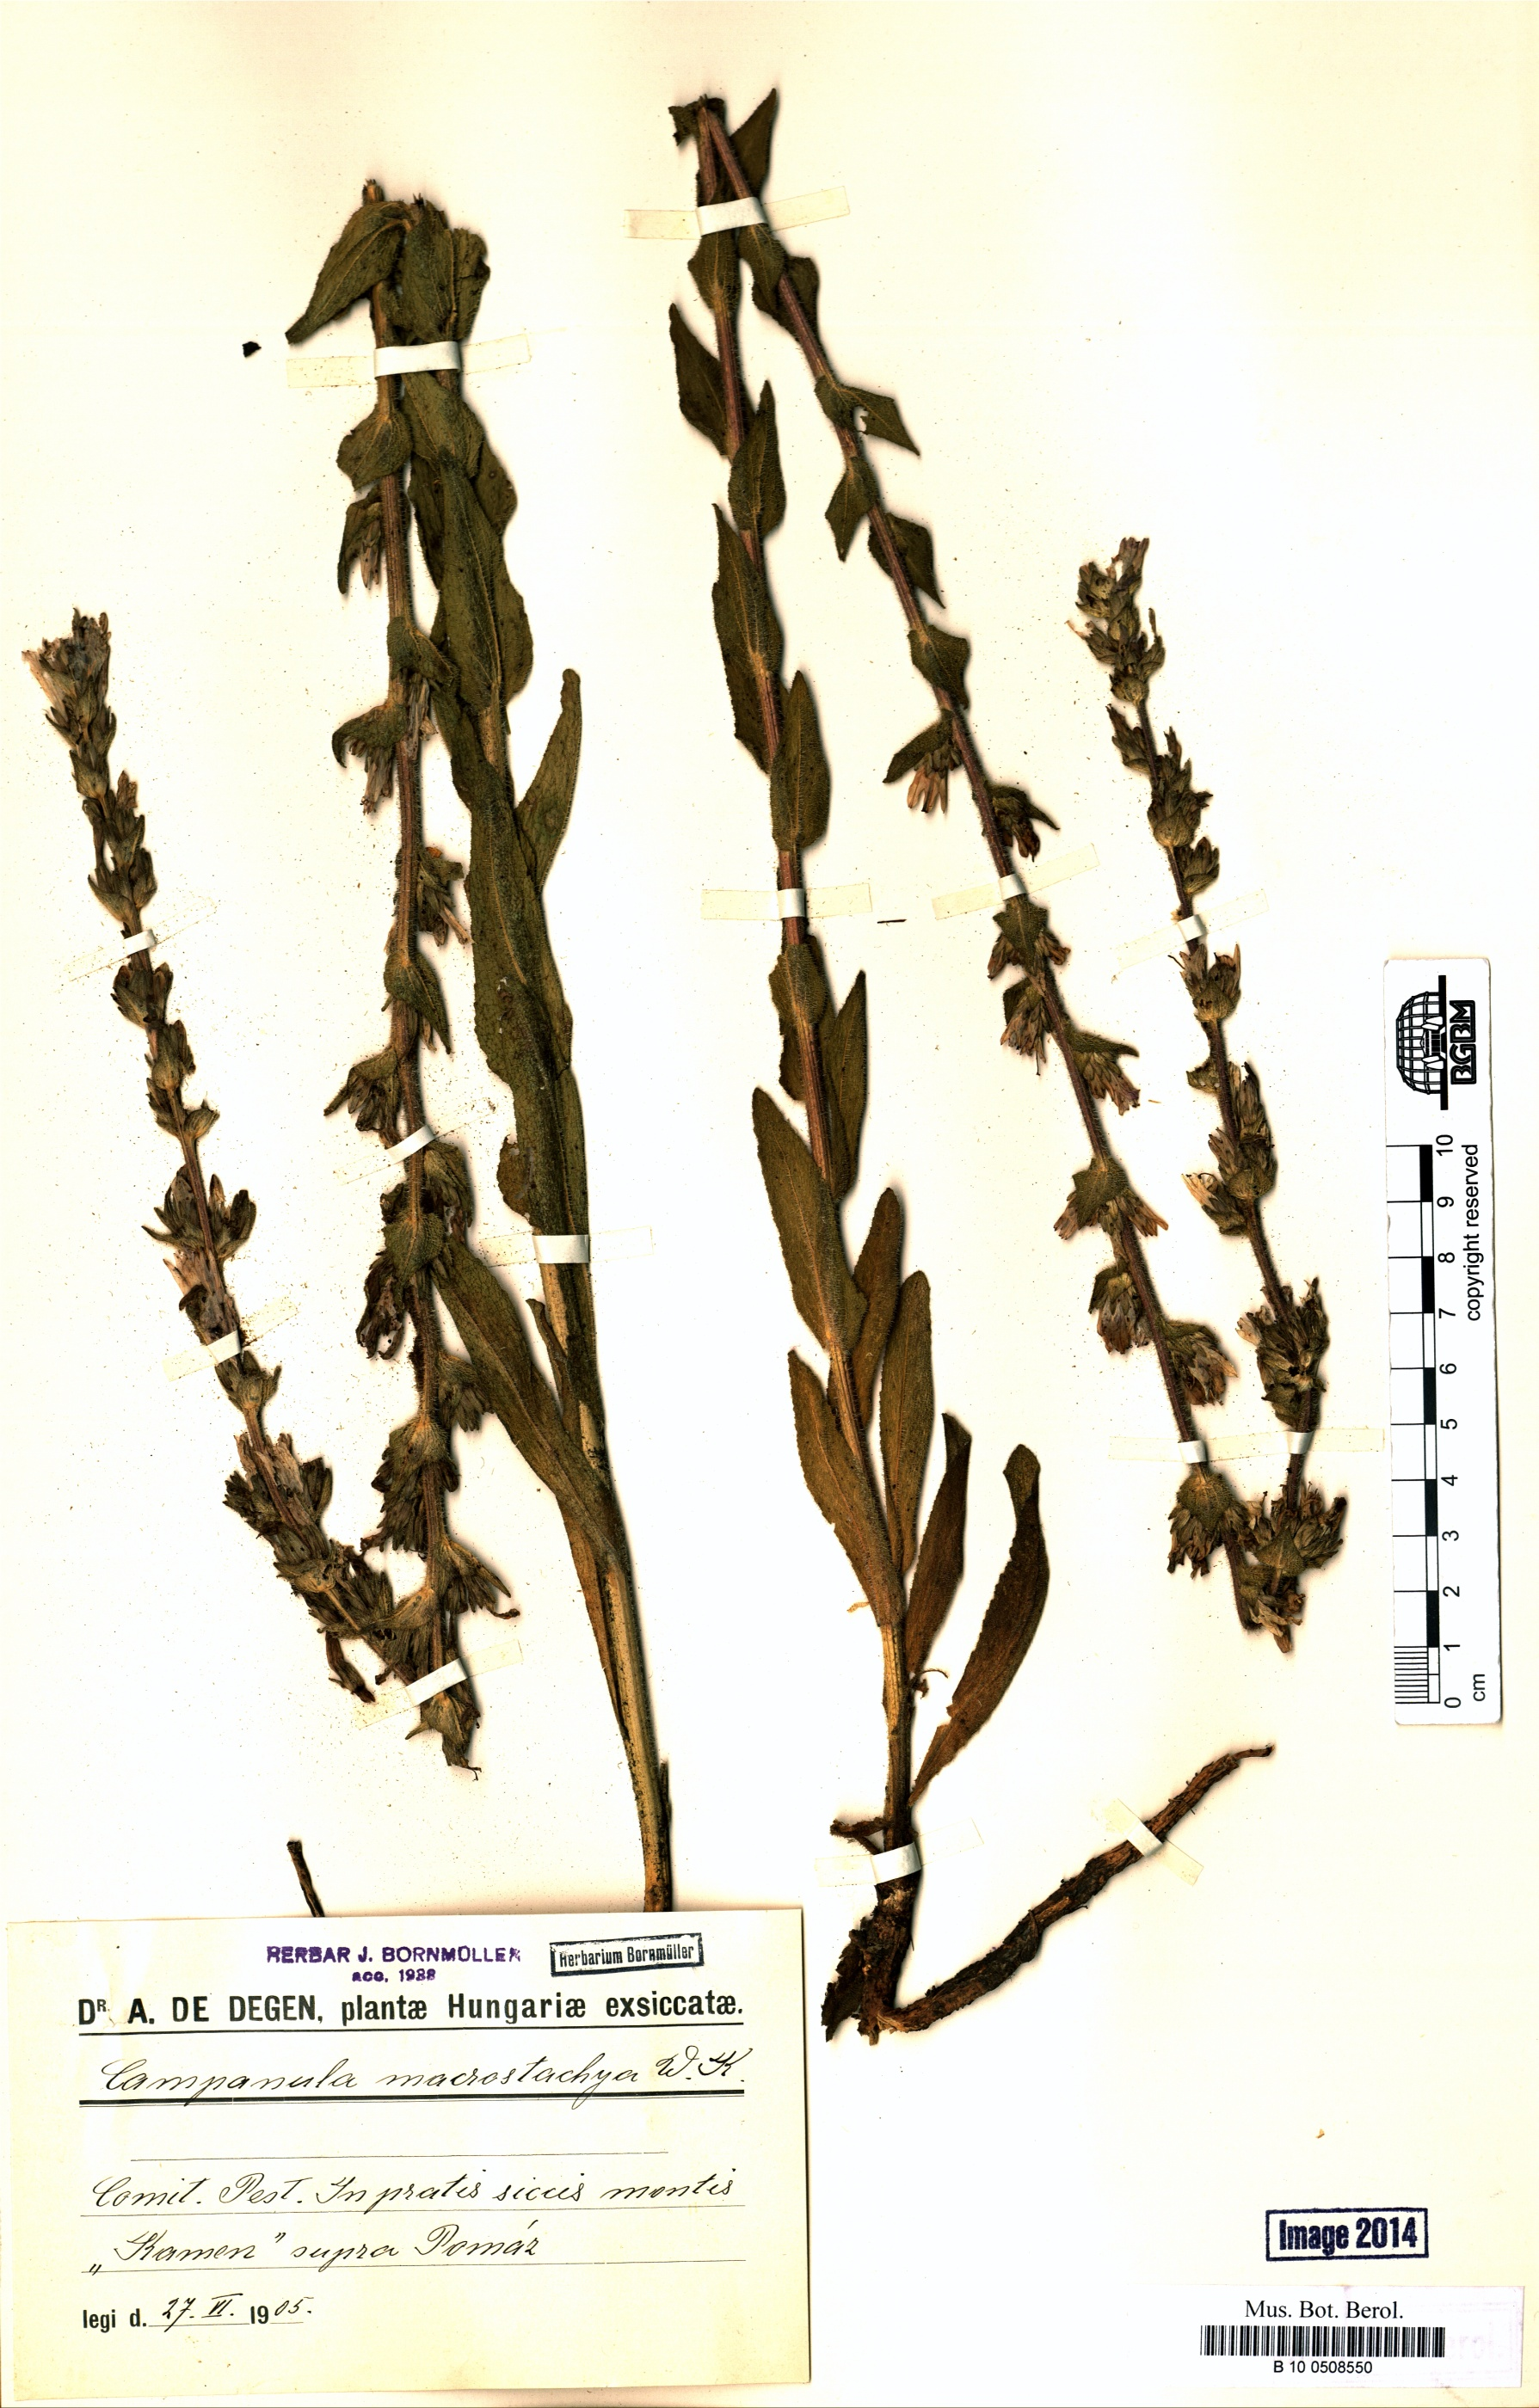 http://ww2.bgbm.org/herbarium/images/B/10/05/08/55/B_10_0508550.jpg